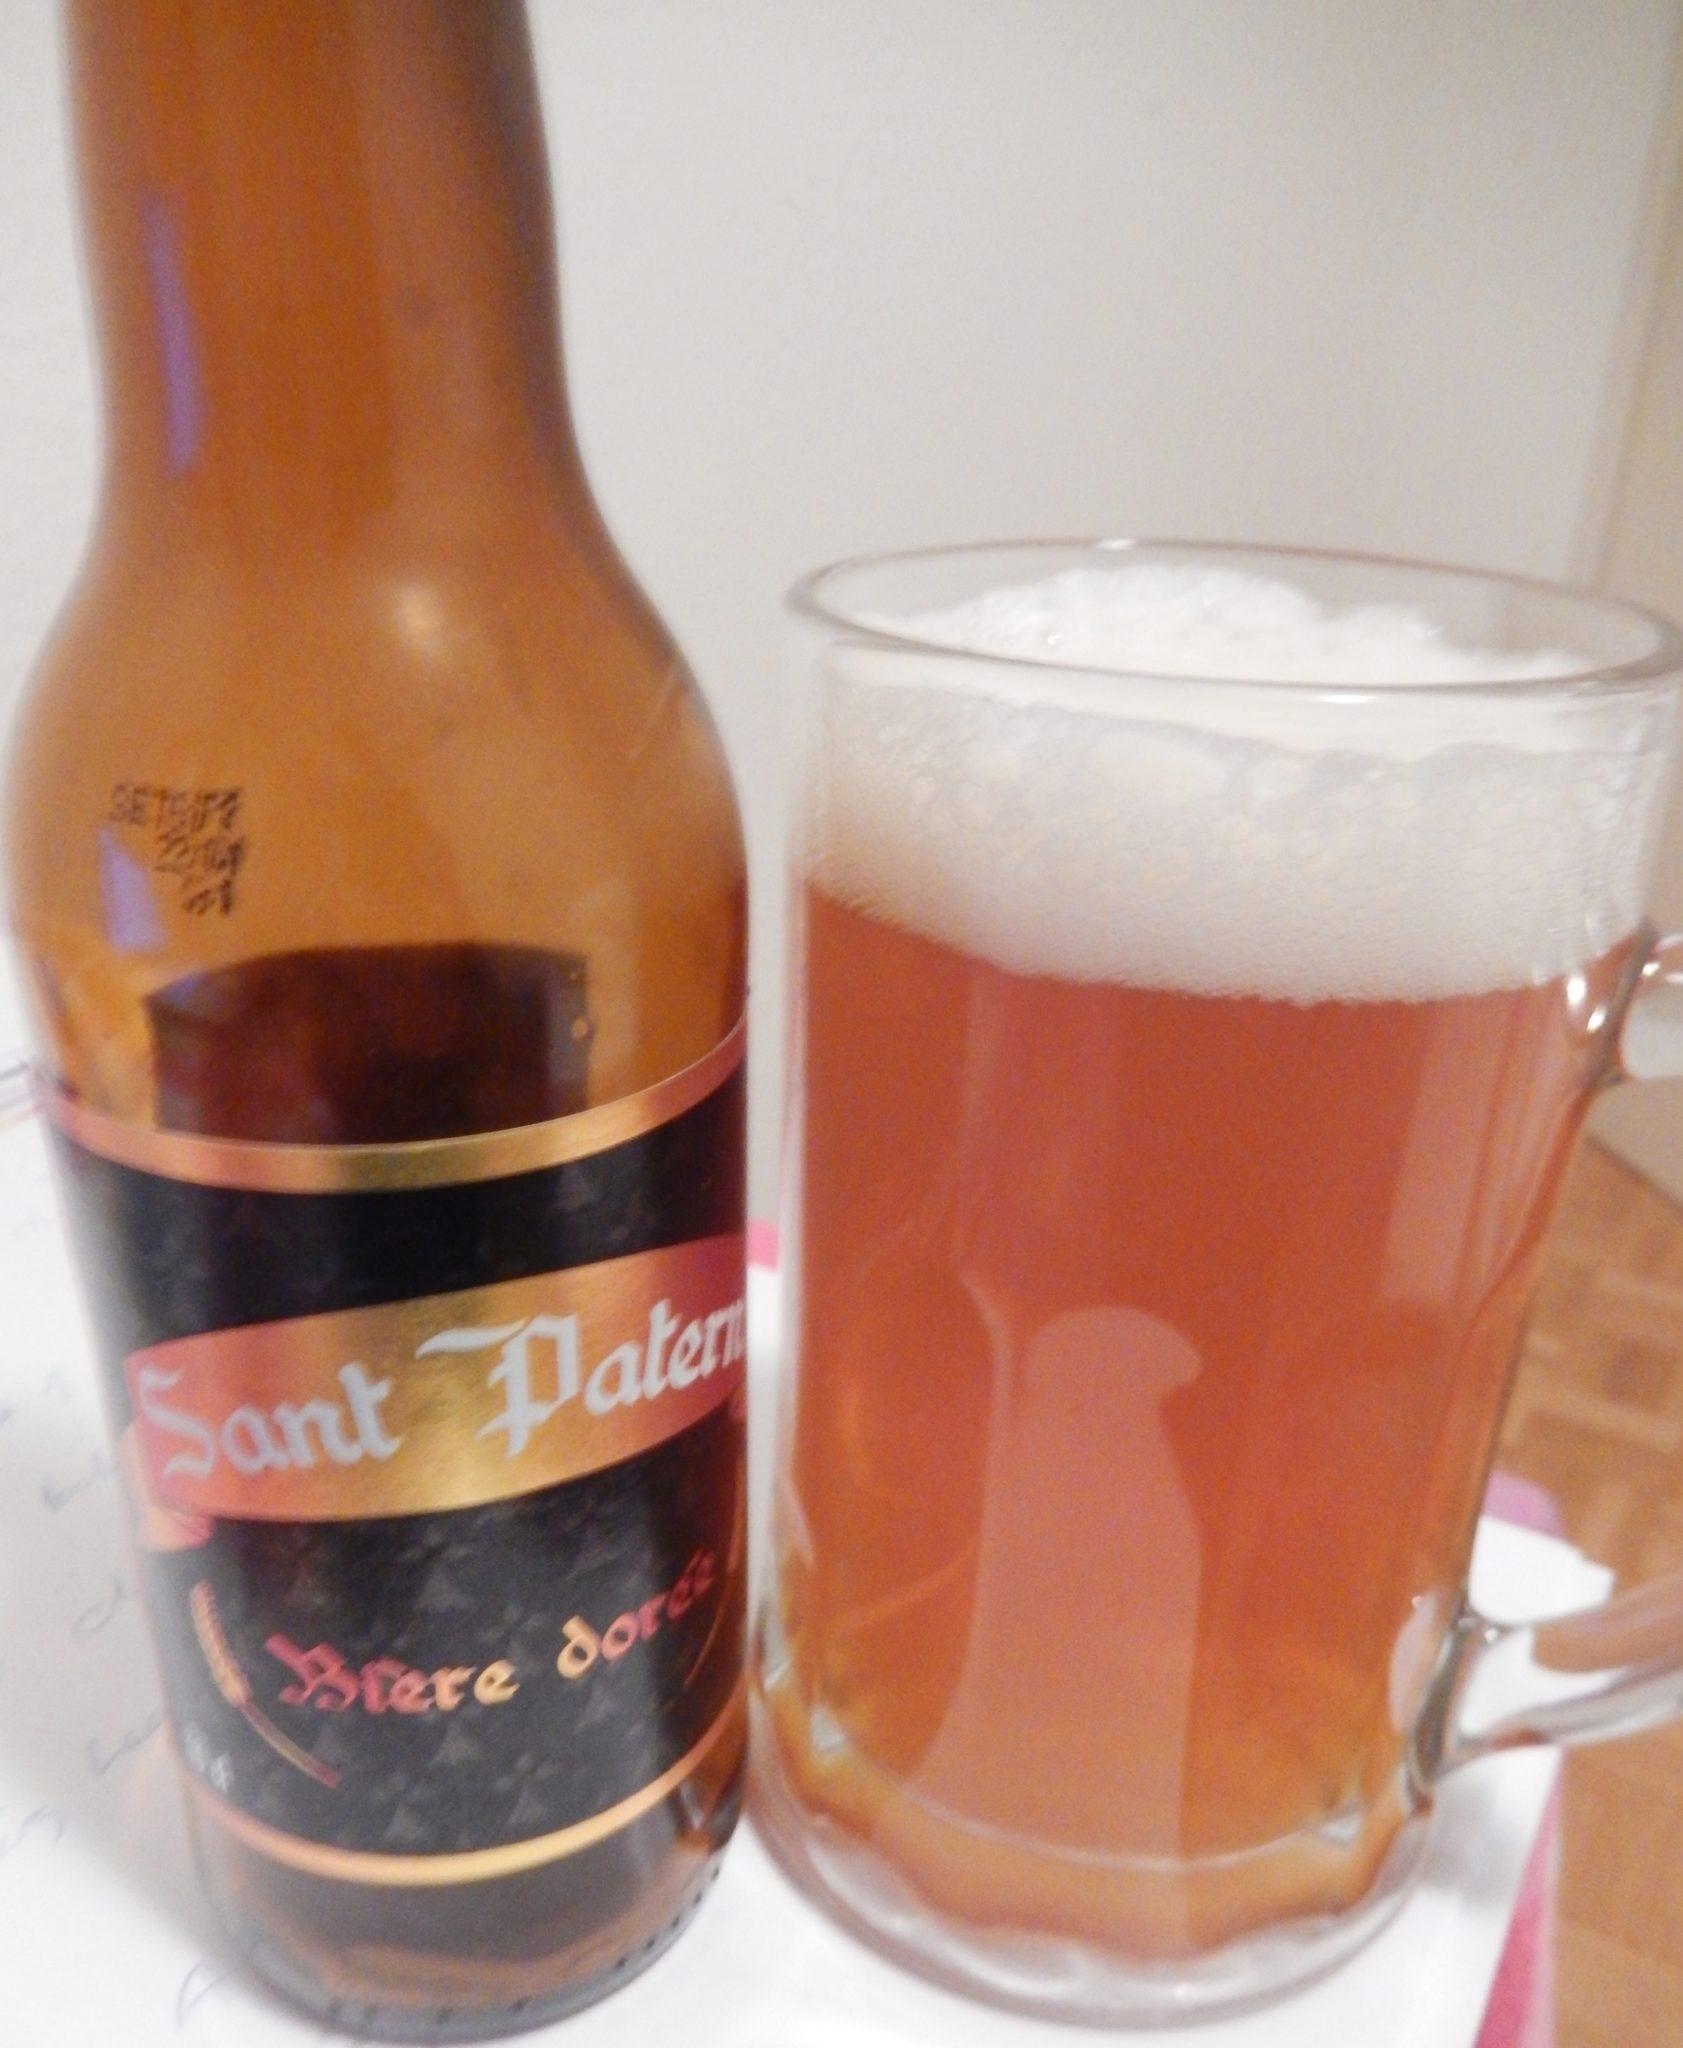 Sant Patern, a Breton beer